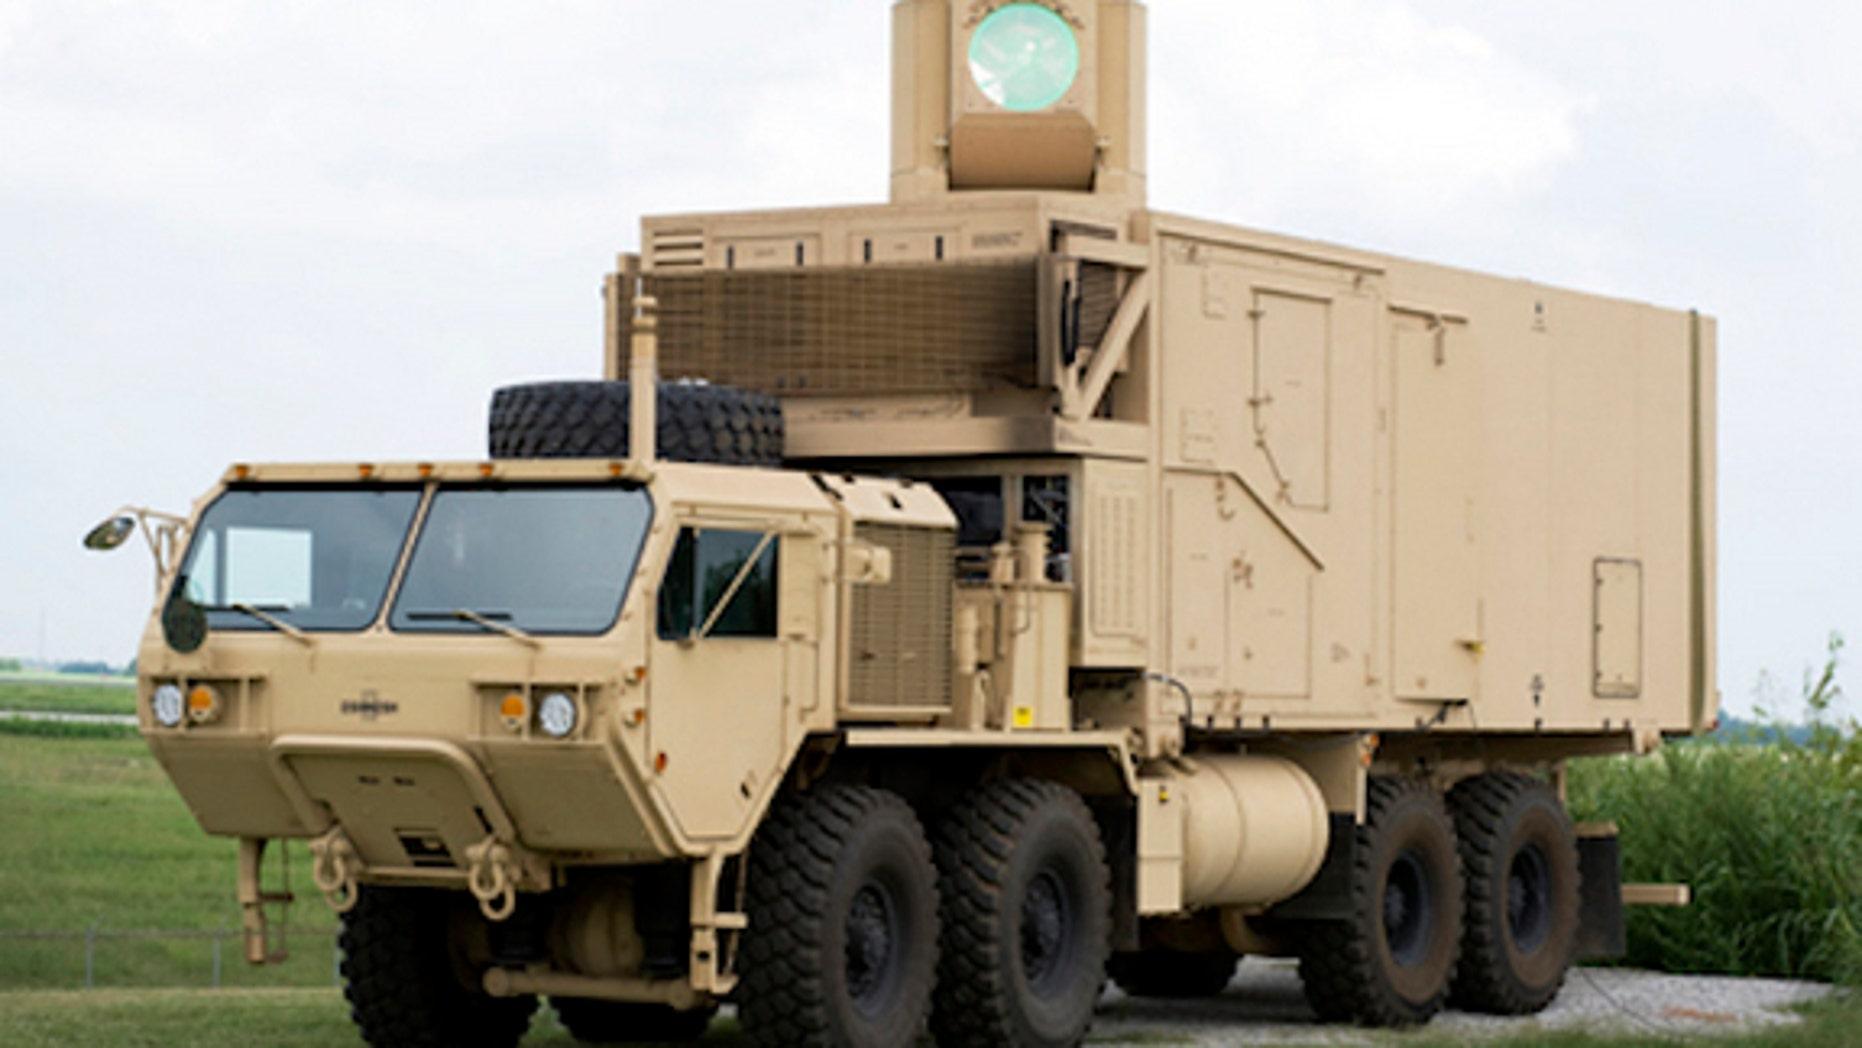 Boeing's High Energy Laser Mobile Demonstrator (HEL MD).